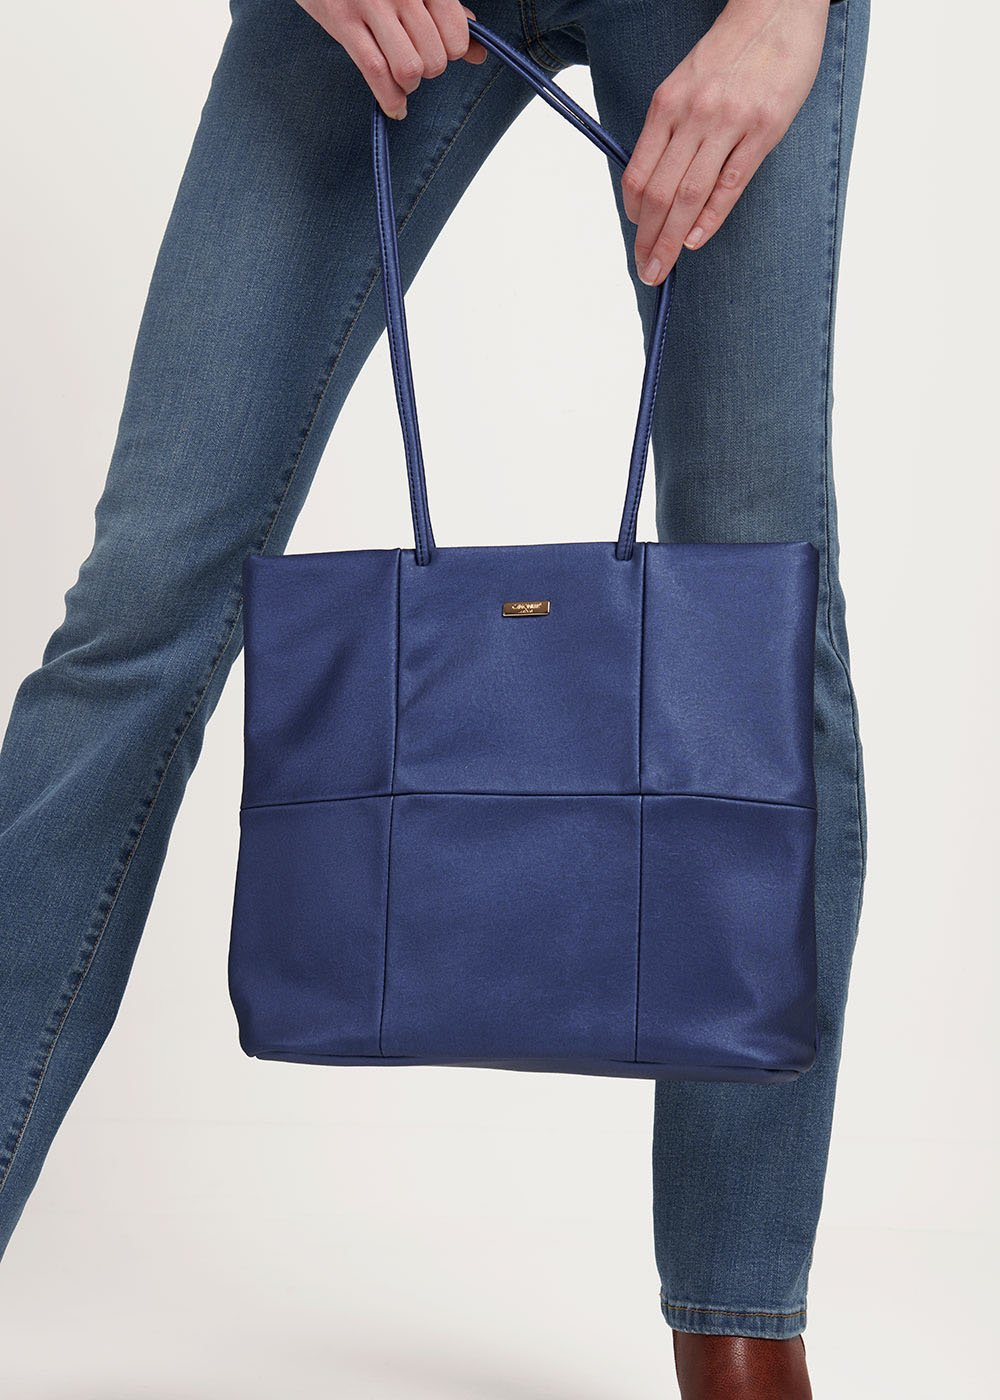 Shopping bag Badel manico lungo - Avion - Donna